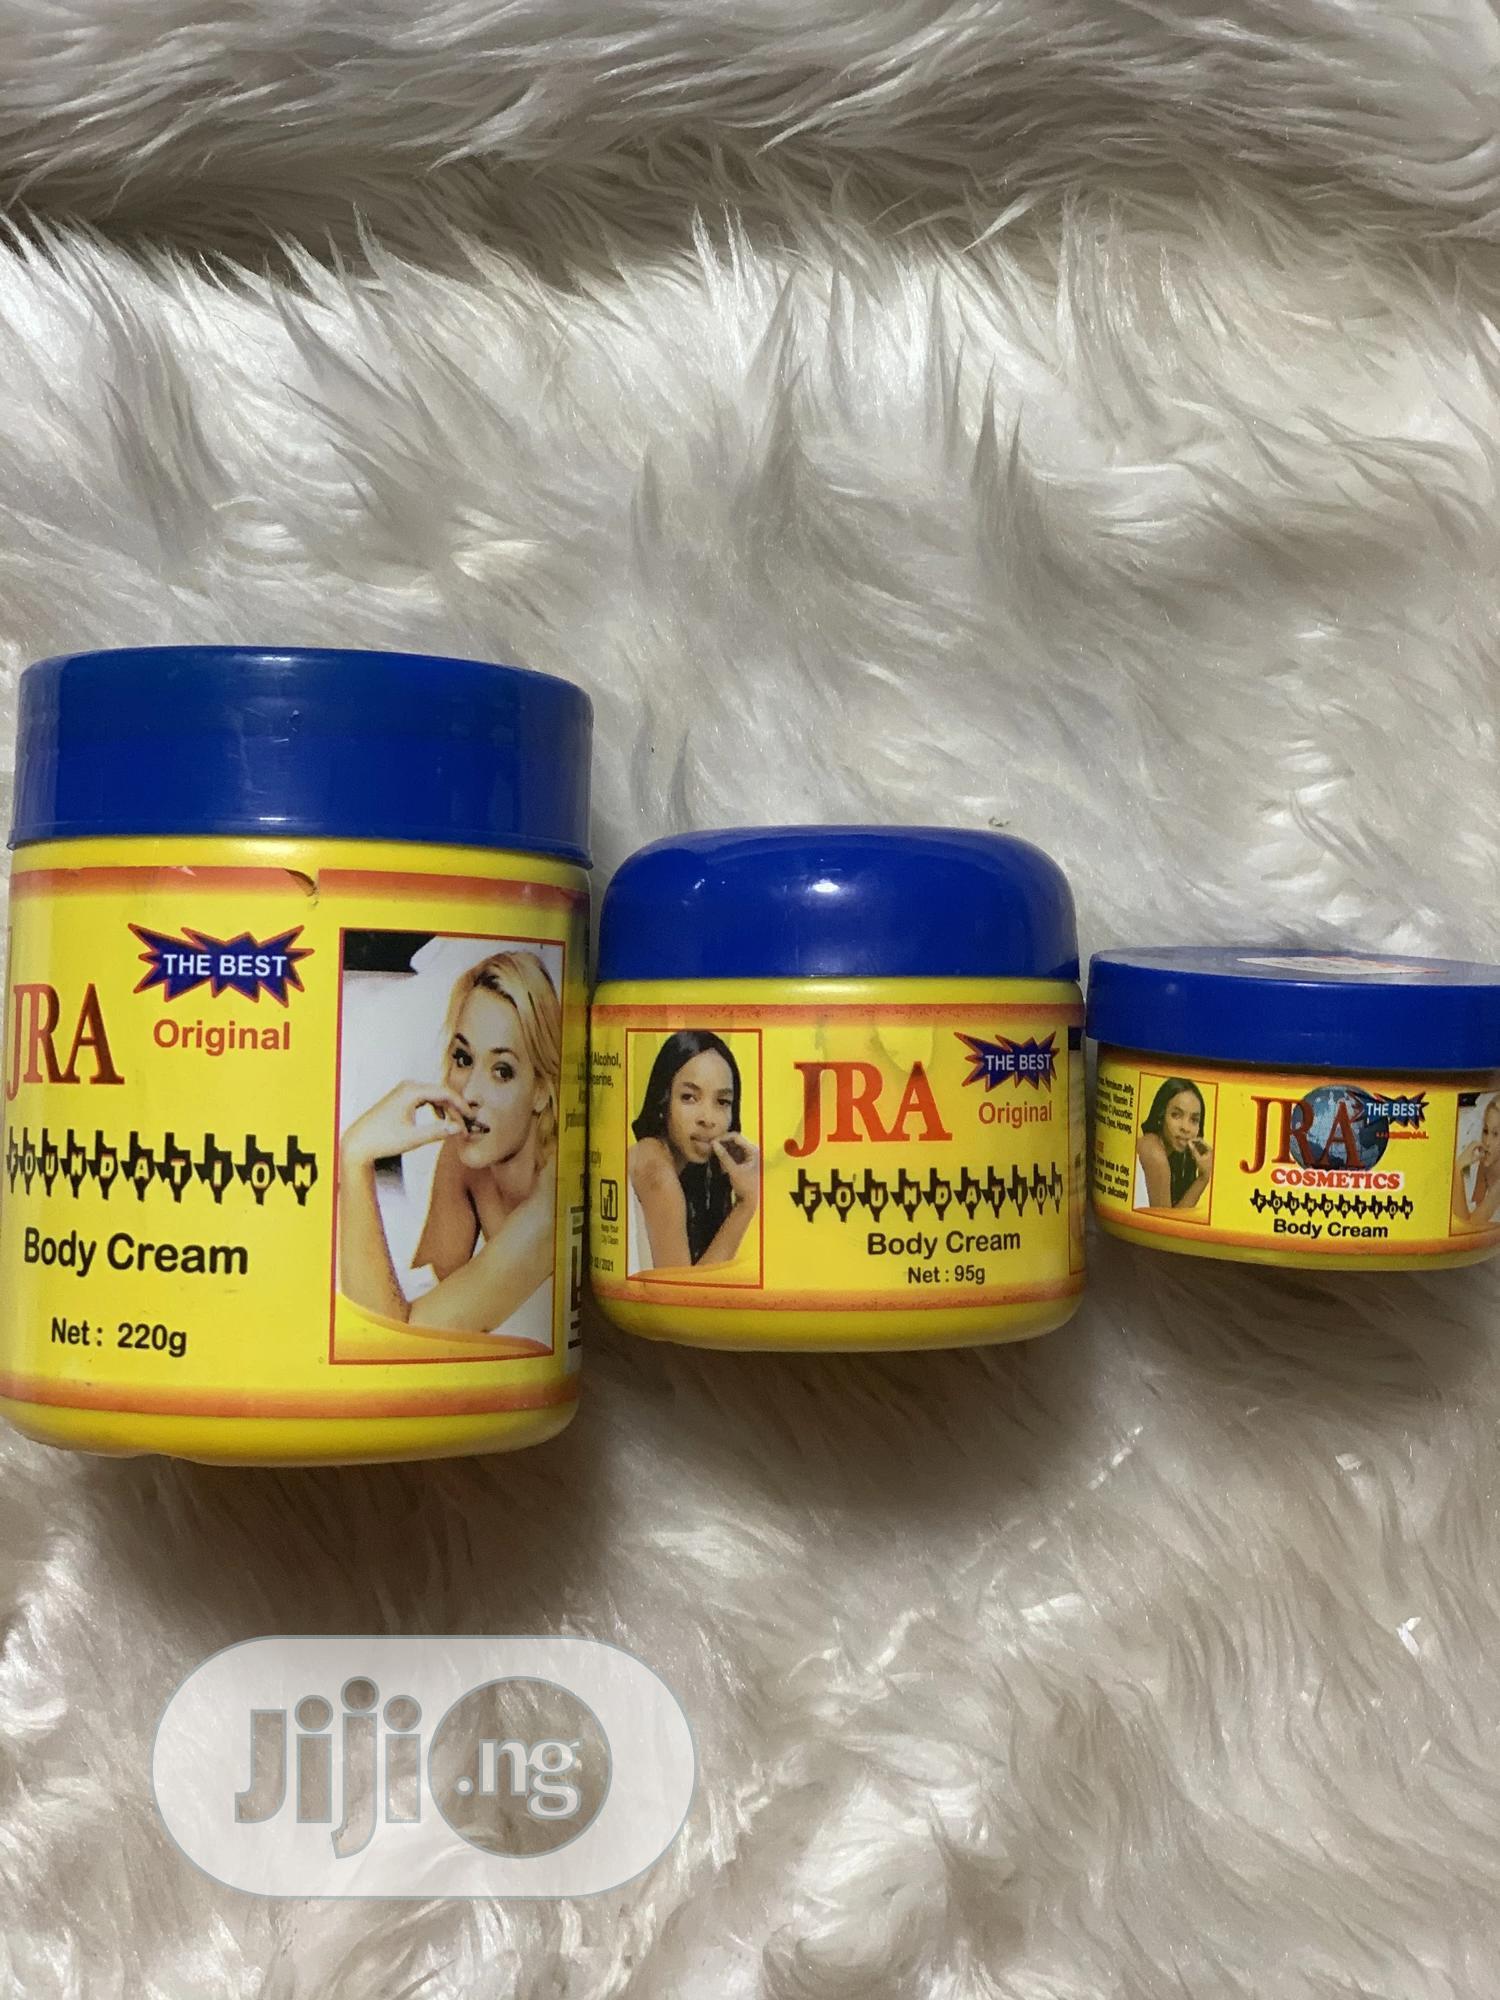 JRA Body Cream And Face Cream